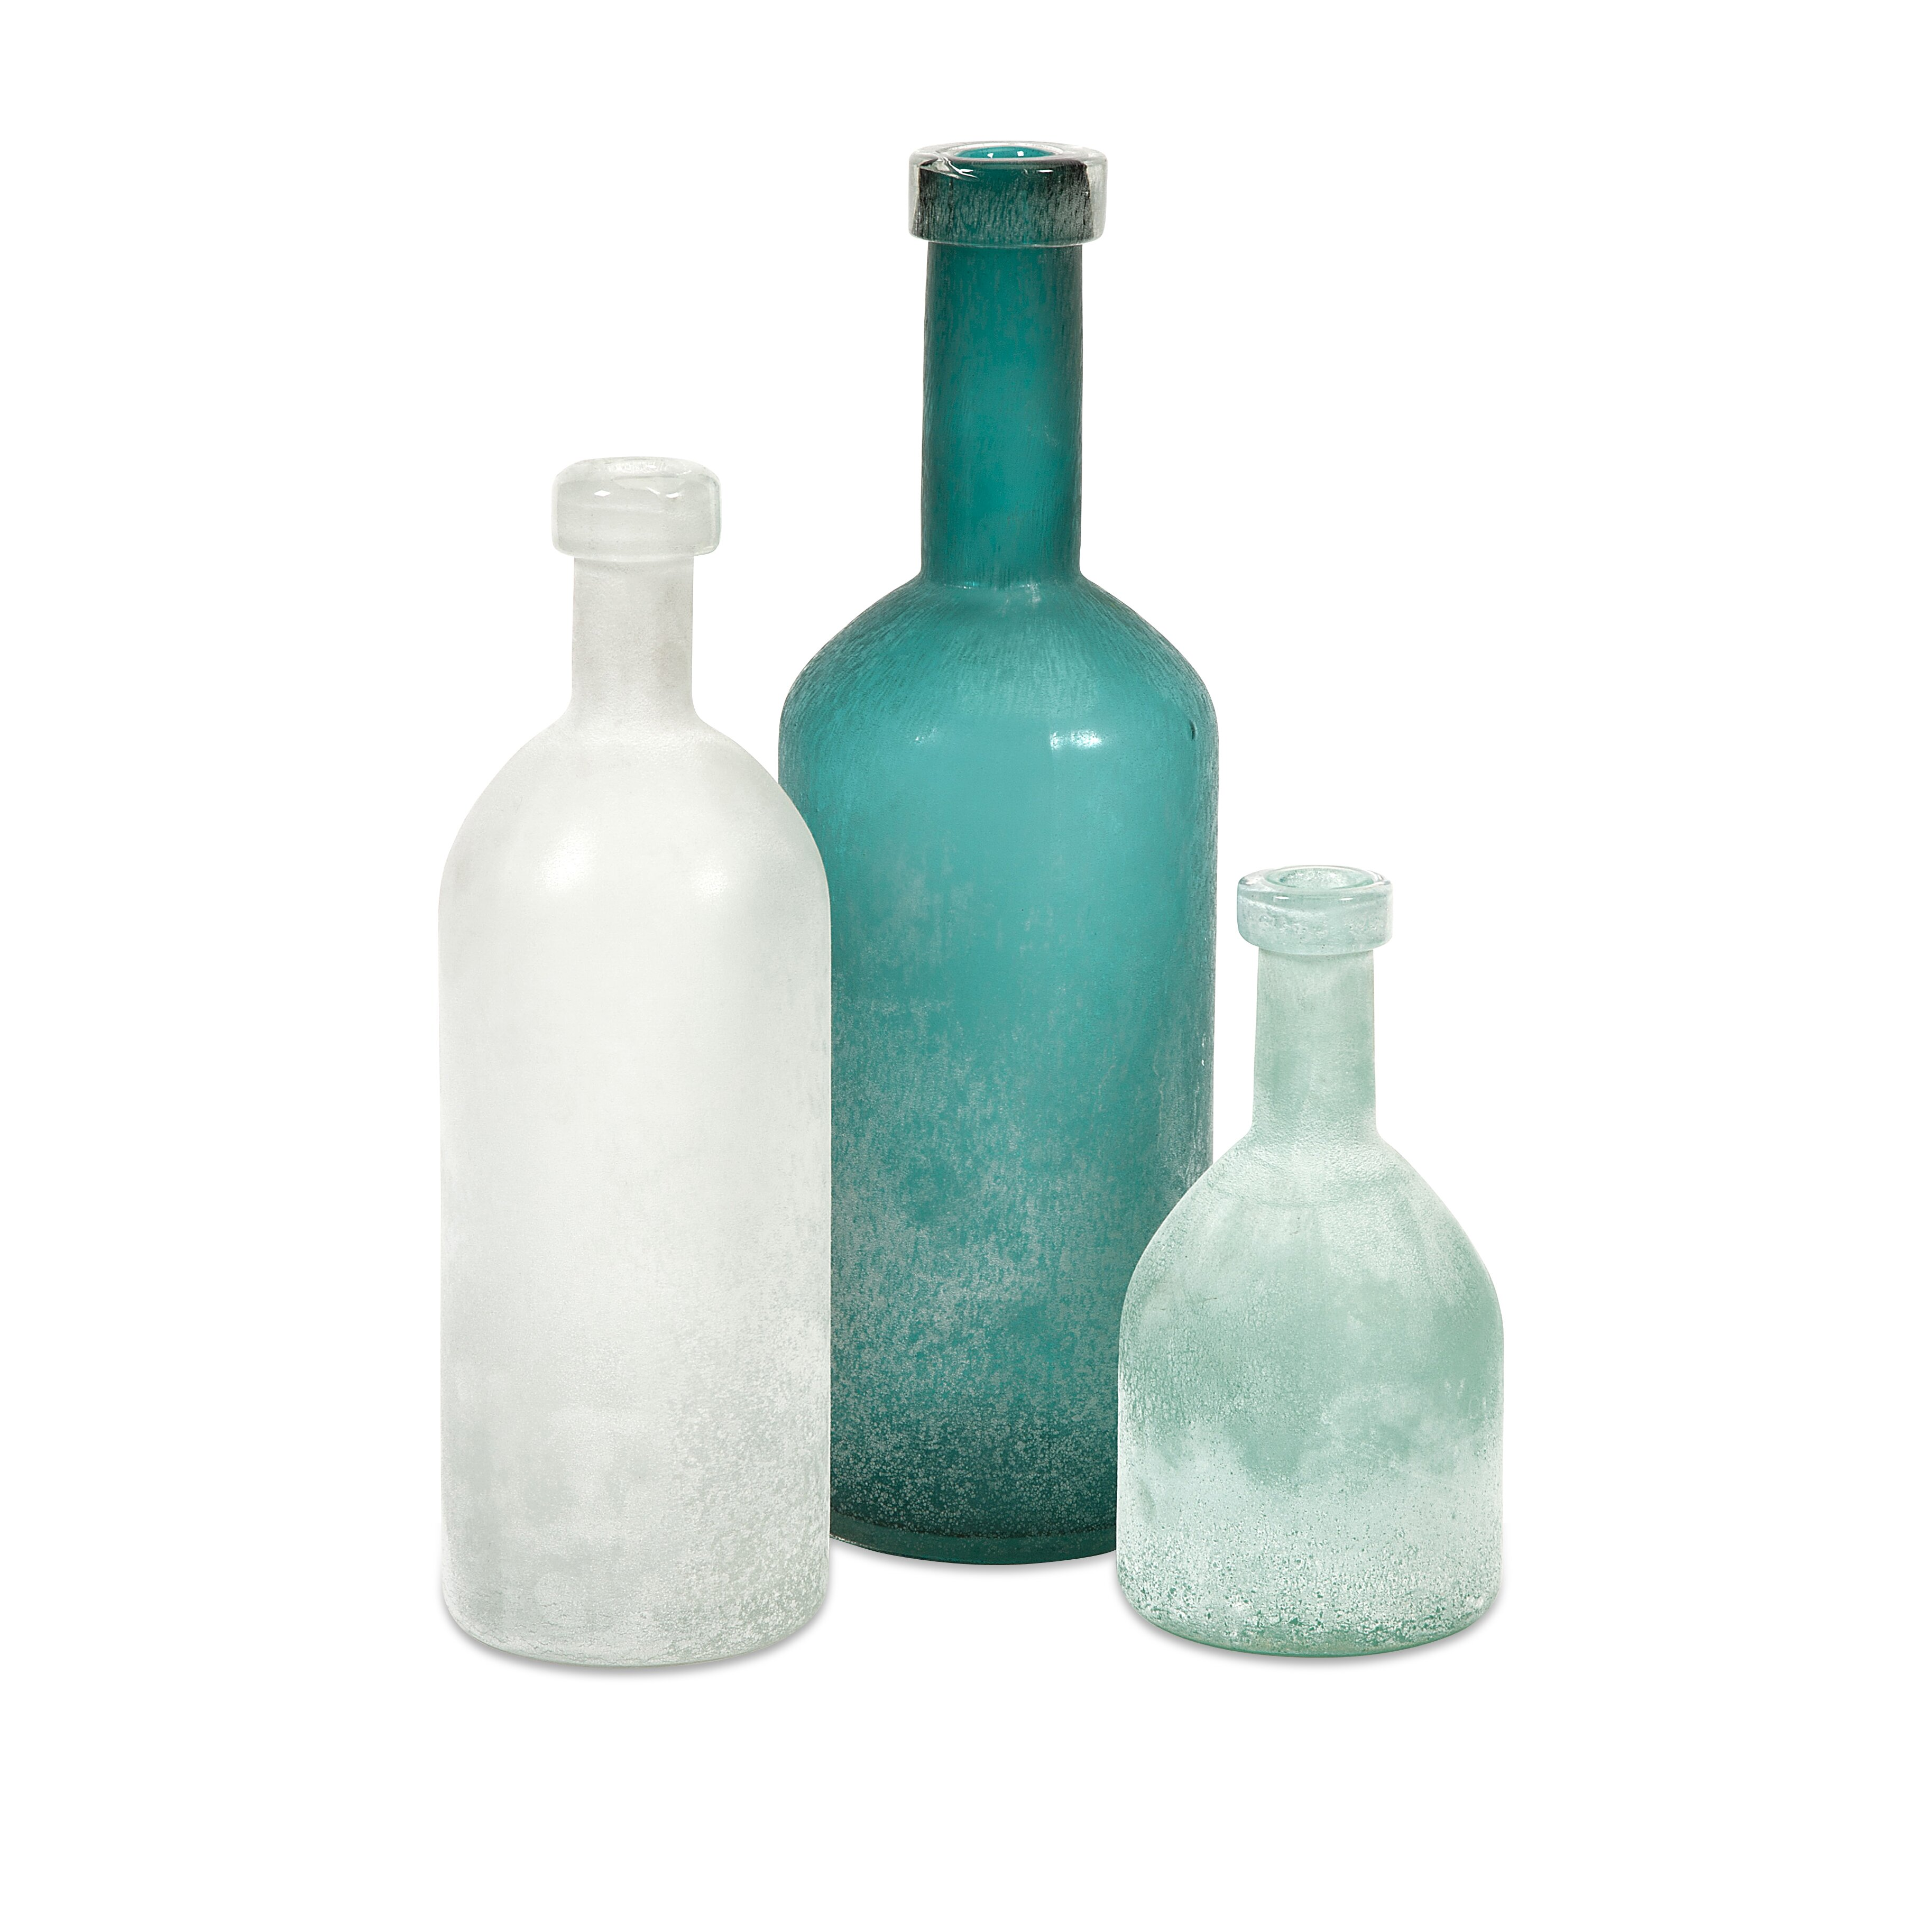 Decorative Vegetable Jars: Beachcrest Home 3 Piece Russell Handblown Glass Decorative